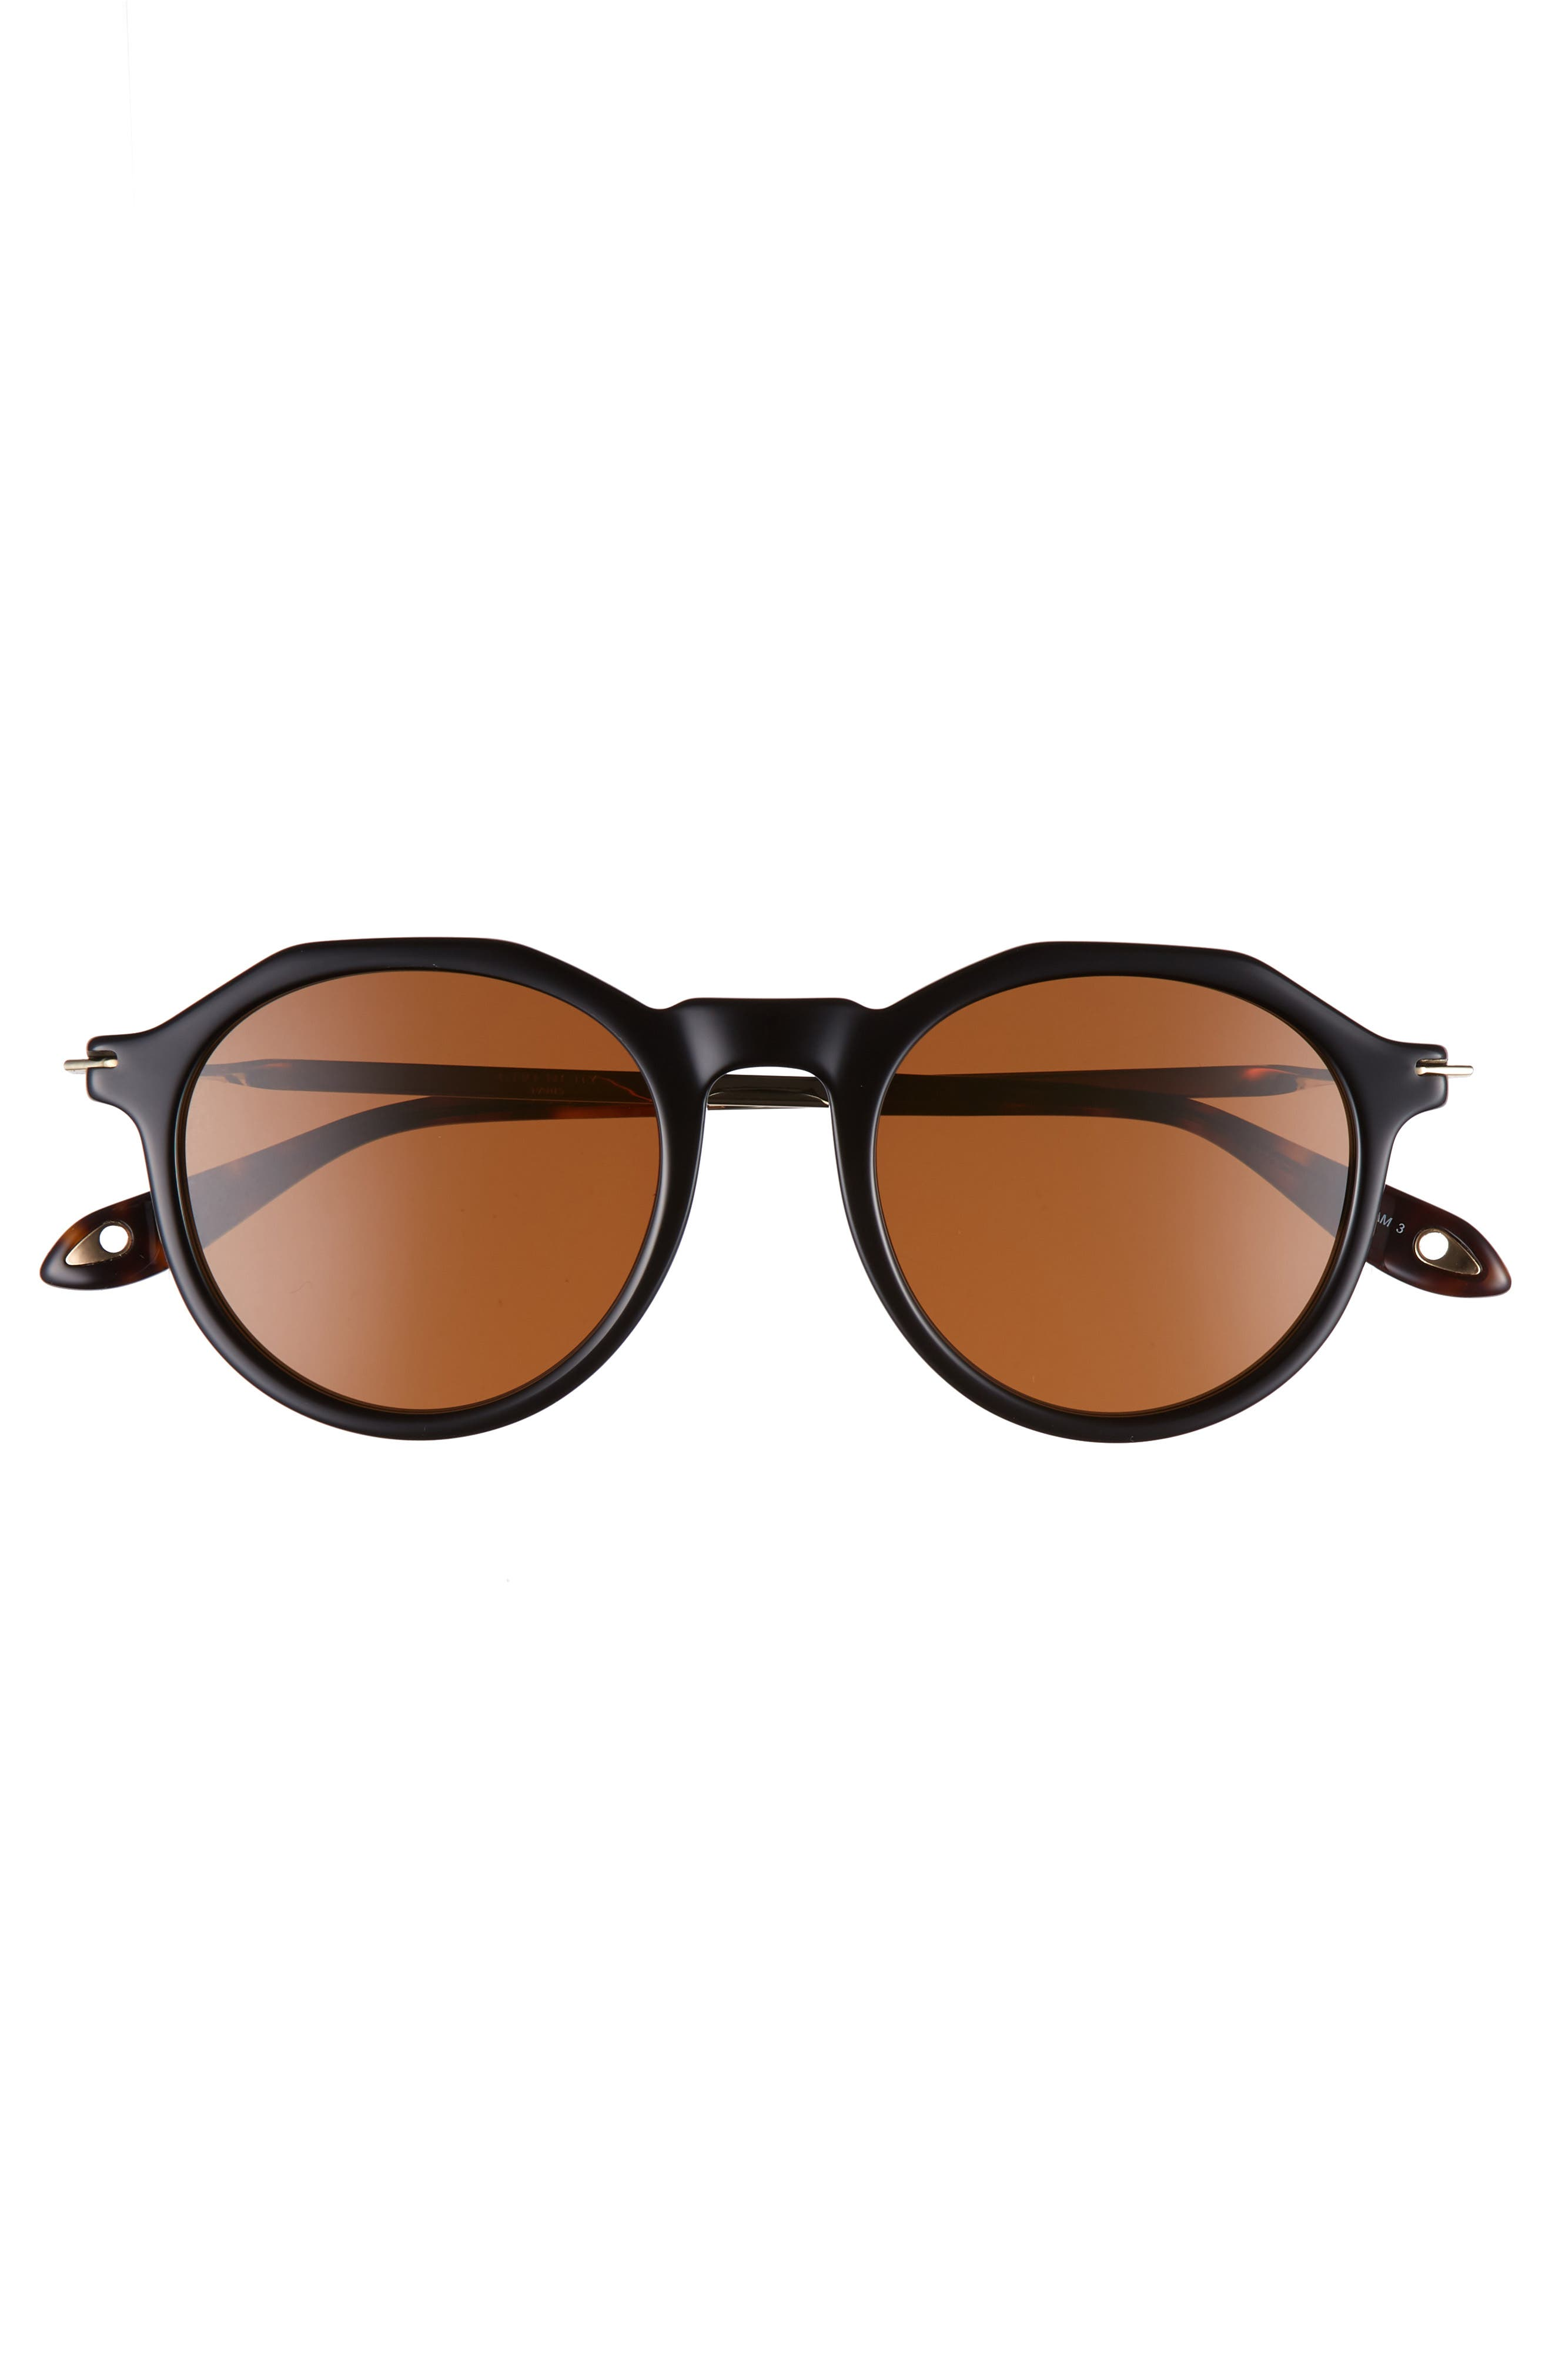 51mm Round Sunglasses,                             Alternate thumbnail 7, color,